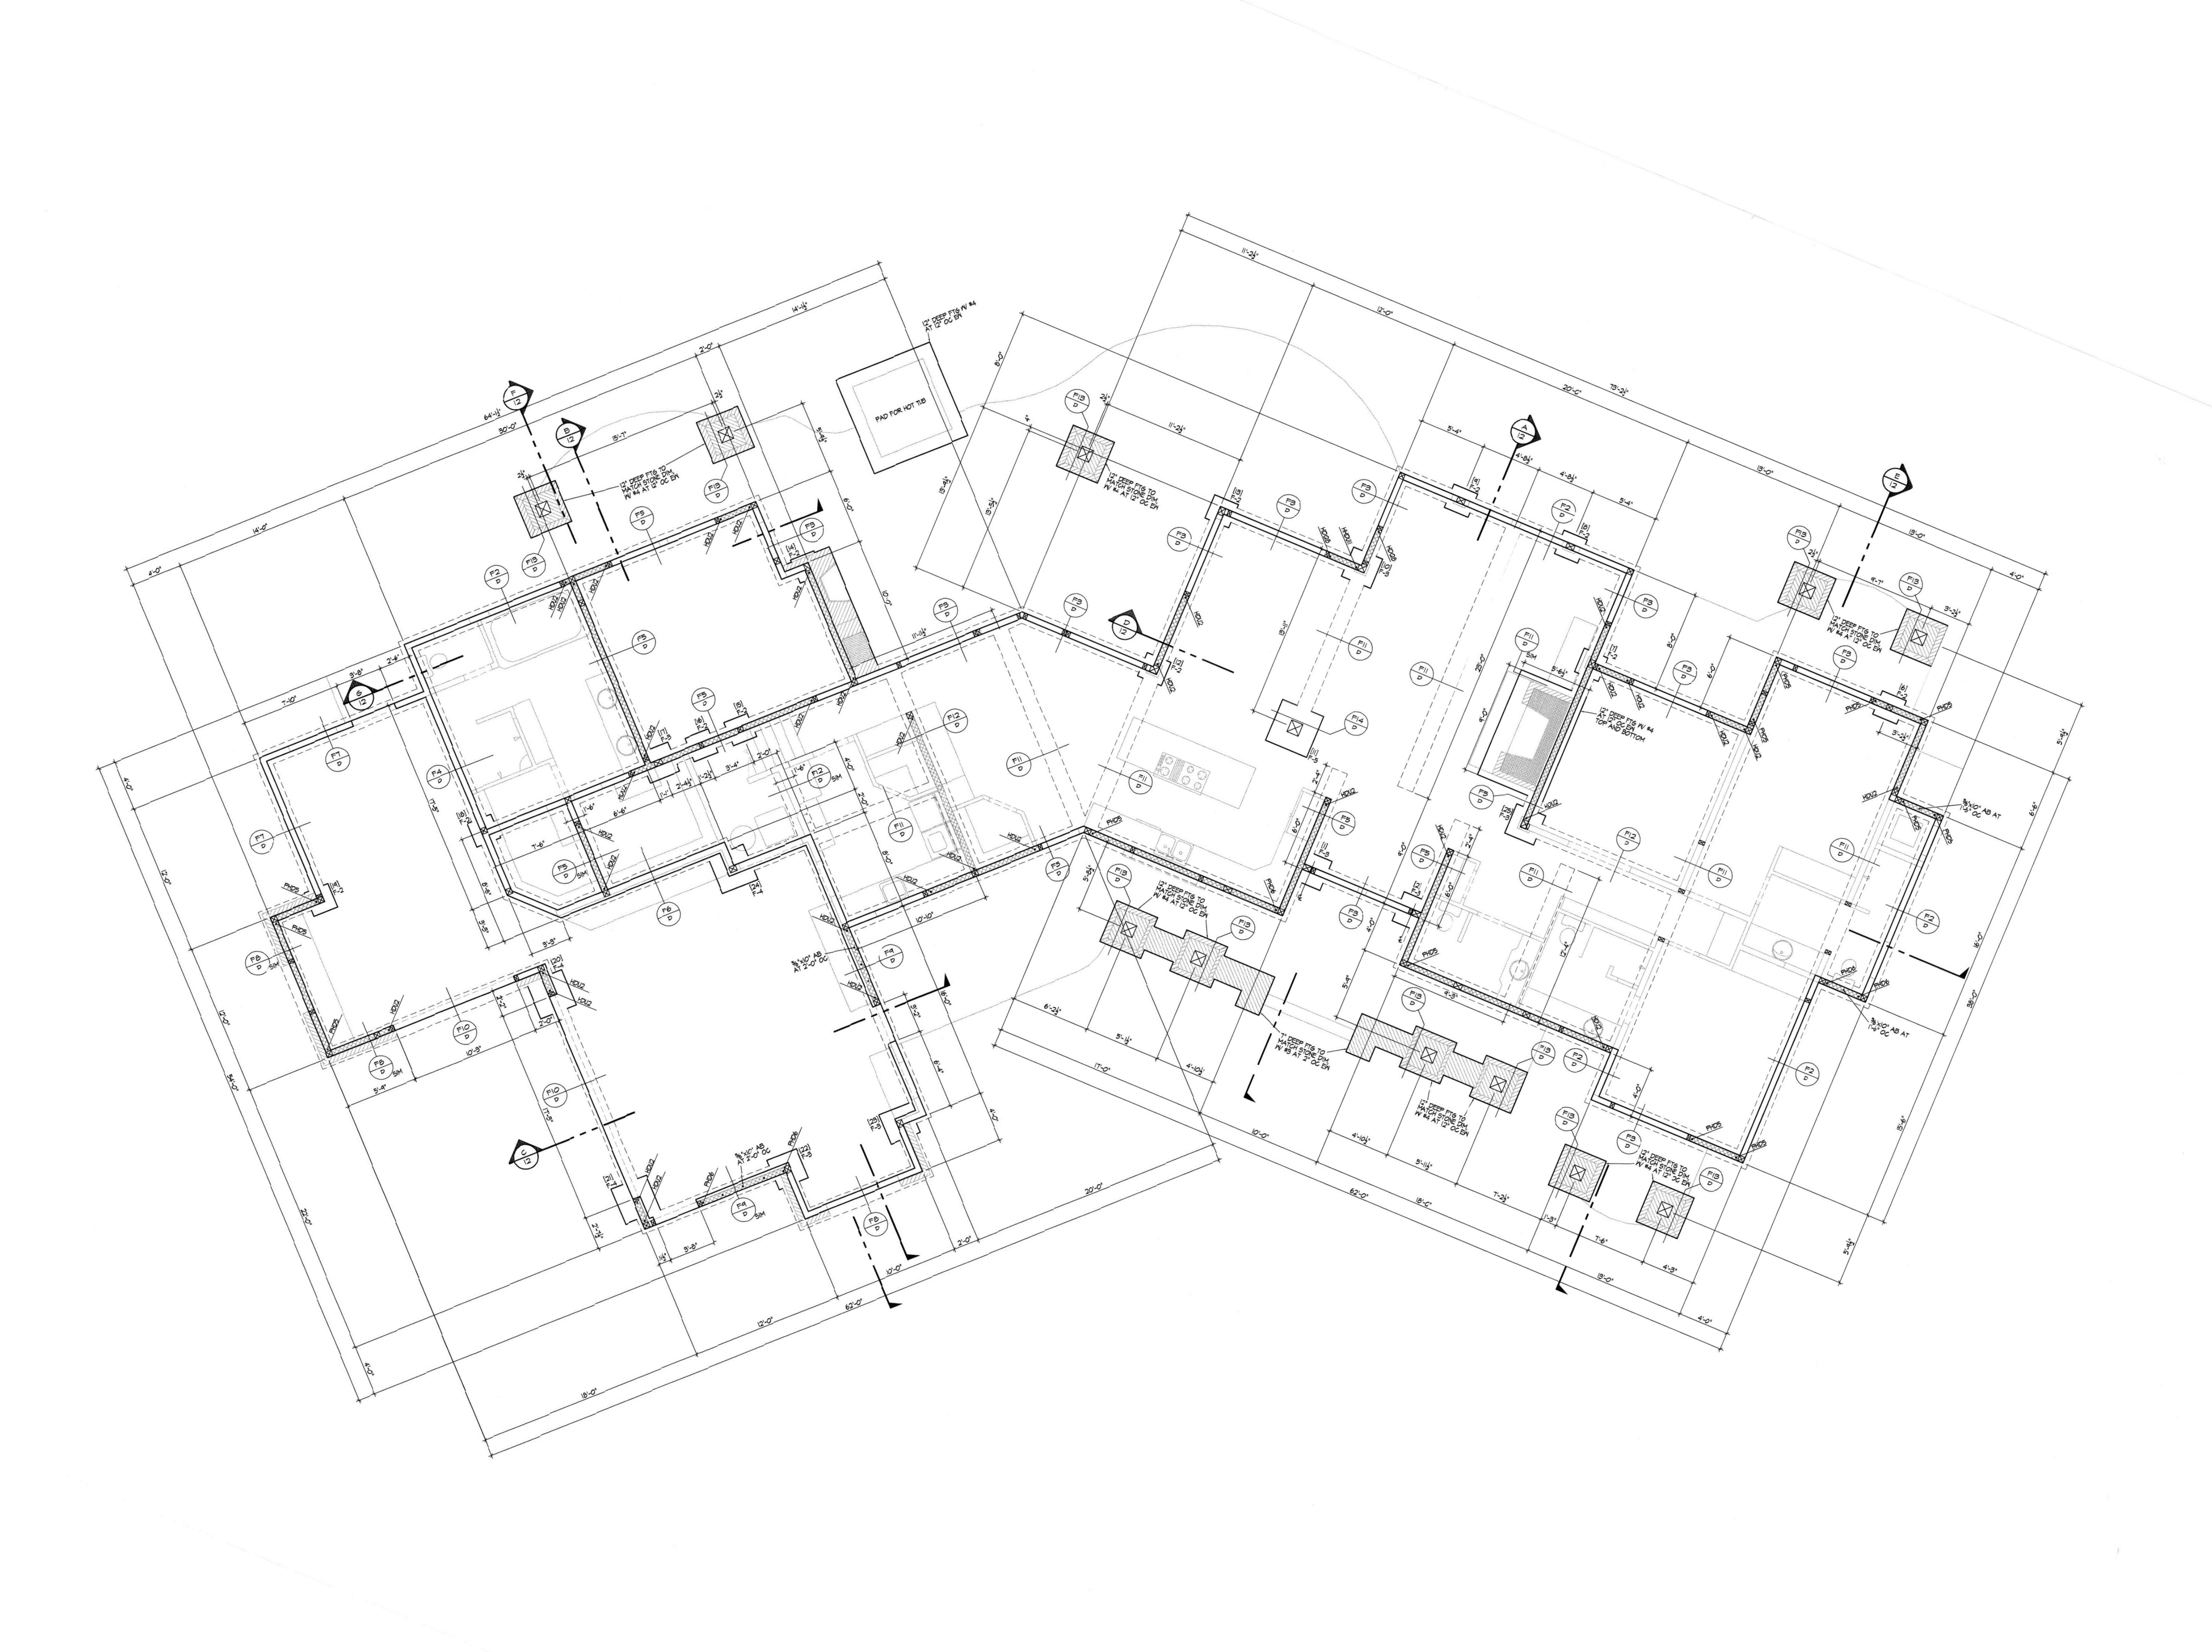 5785x4320 Neptune Design Studios Architectural Cad Services This Site Is